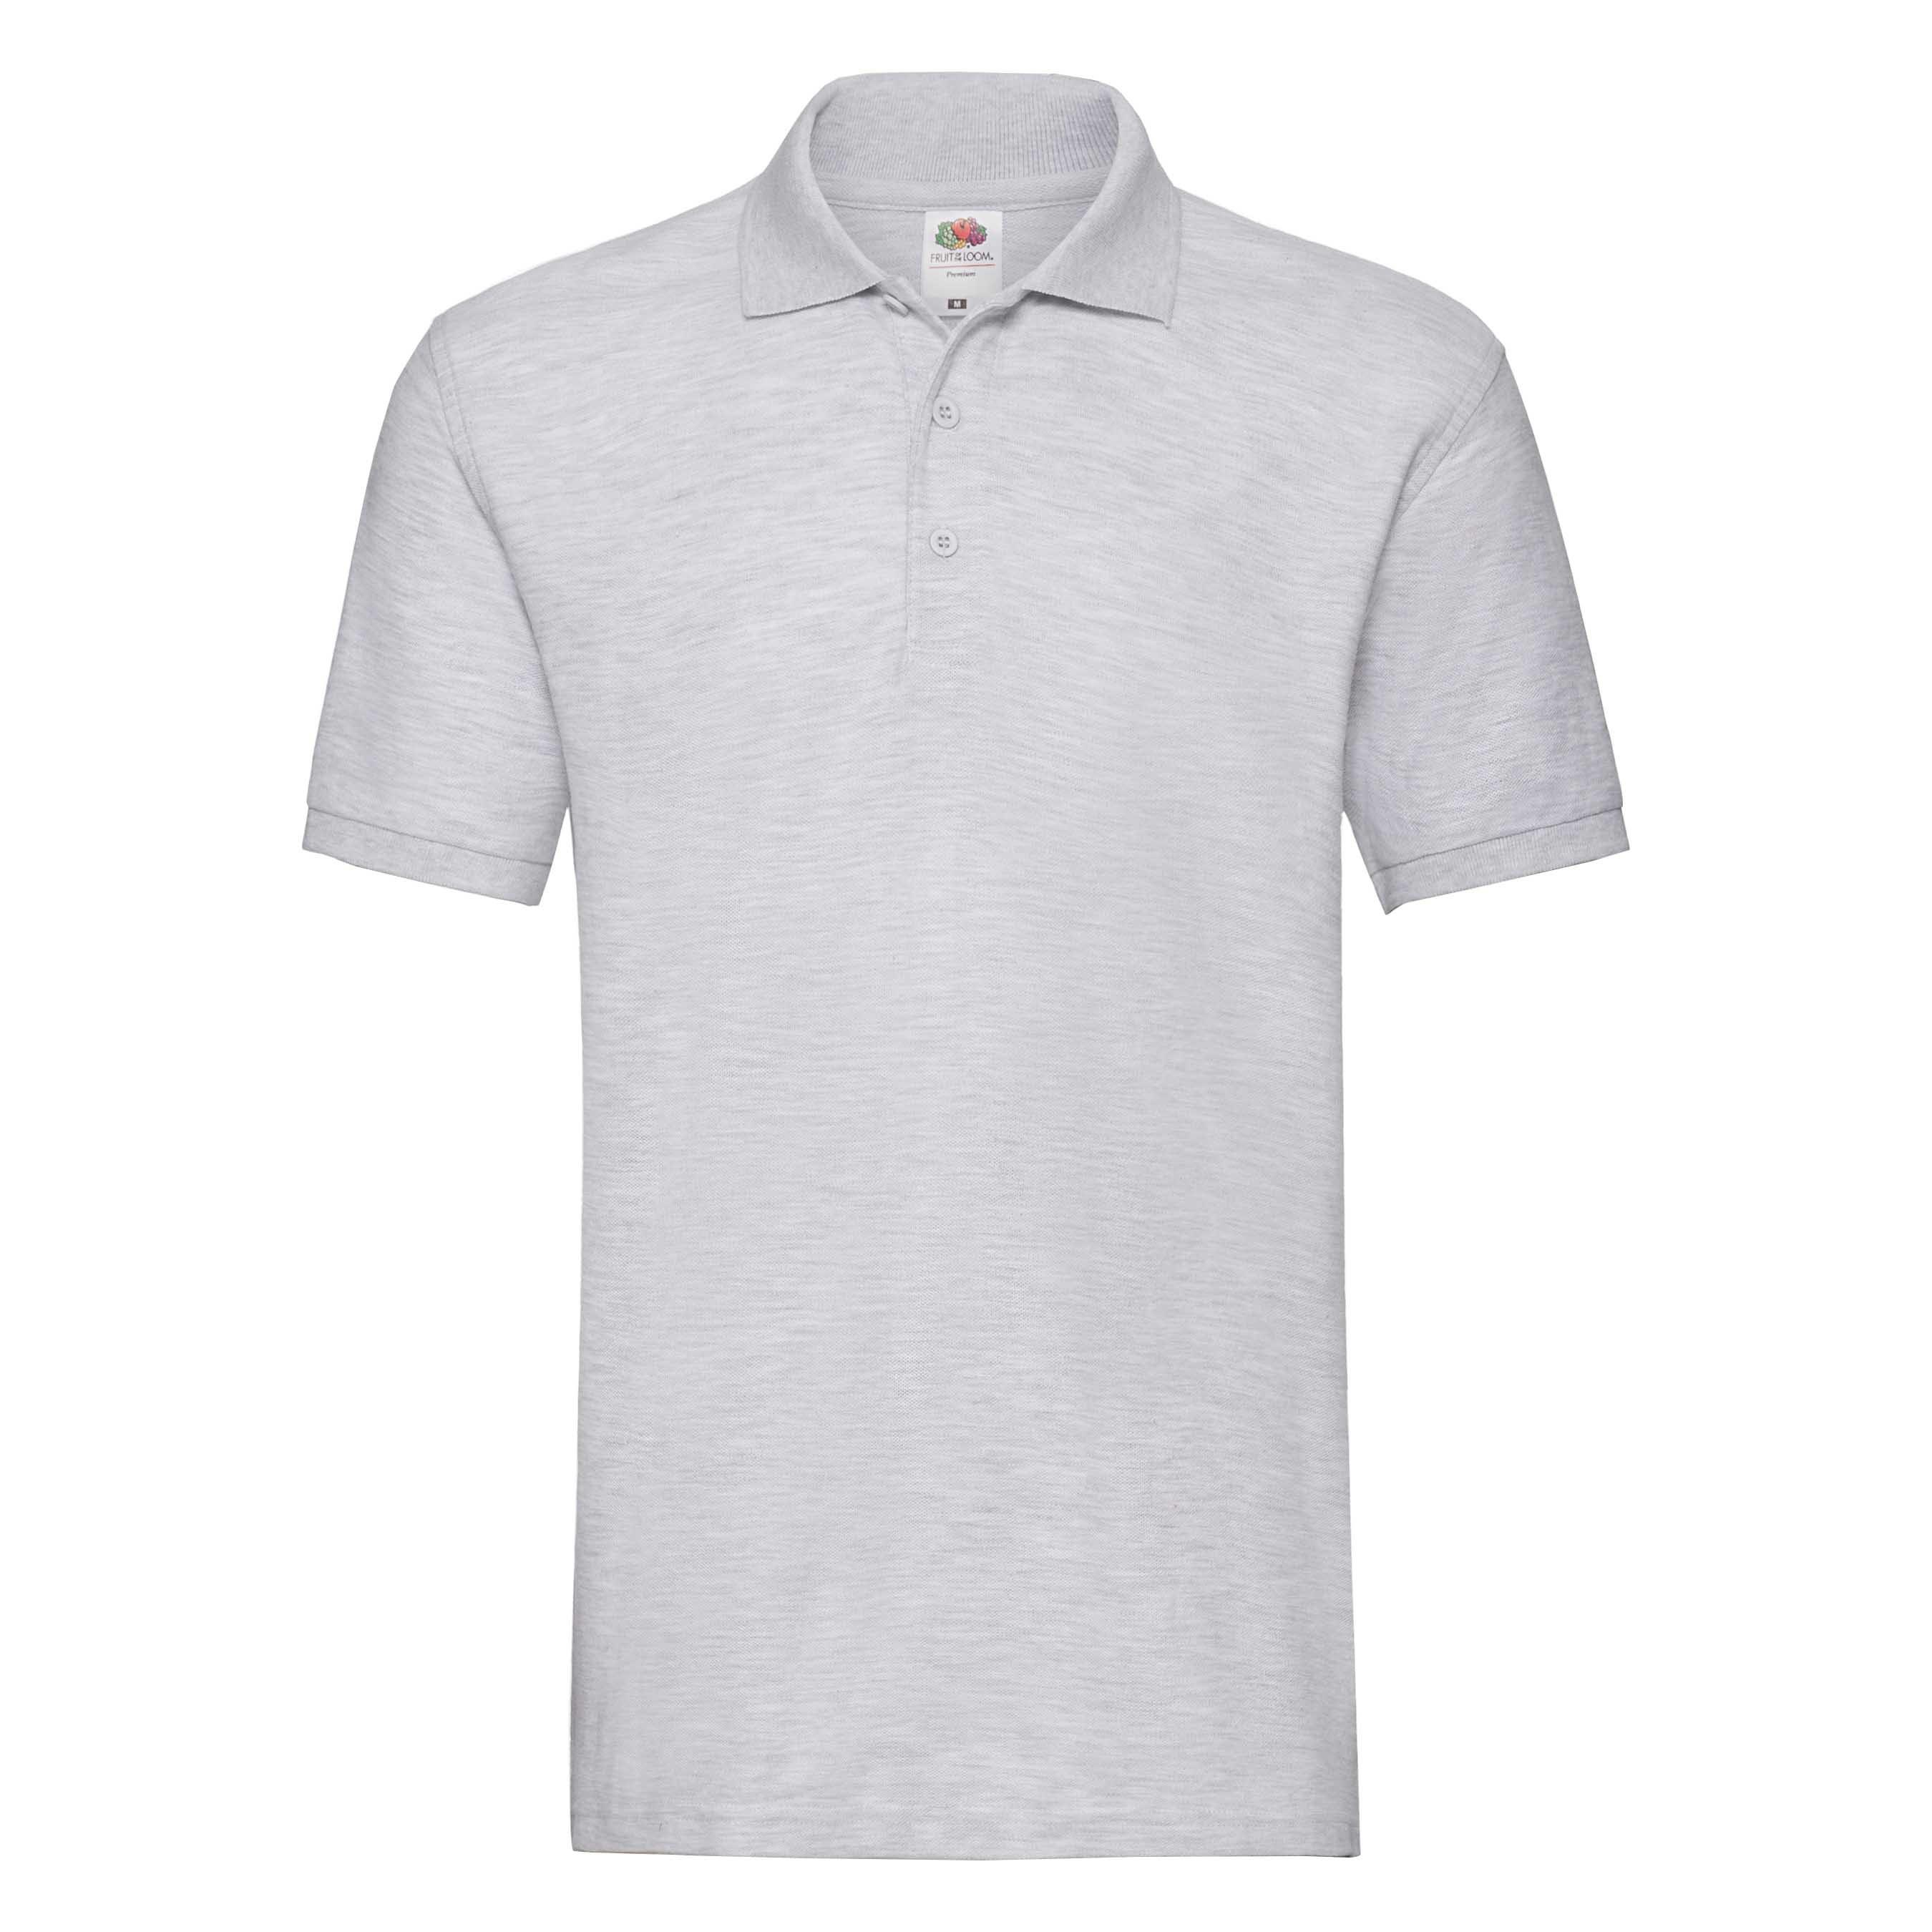 b4d7ae60a1e6 Dámske tričko LADY-FIT CREW NECK TEE - Fruitshop